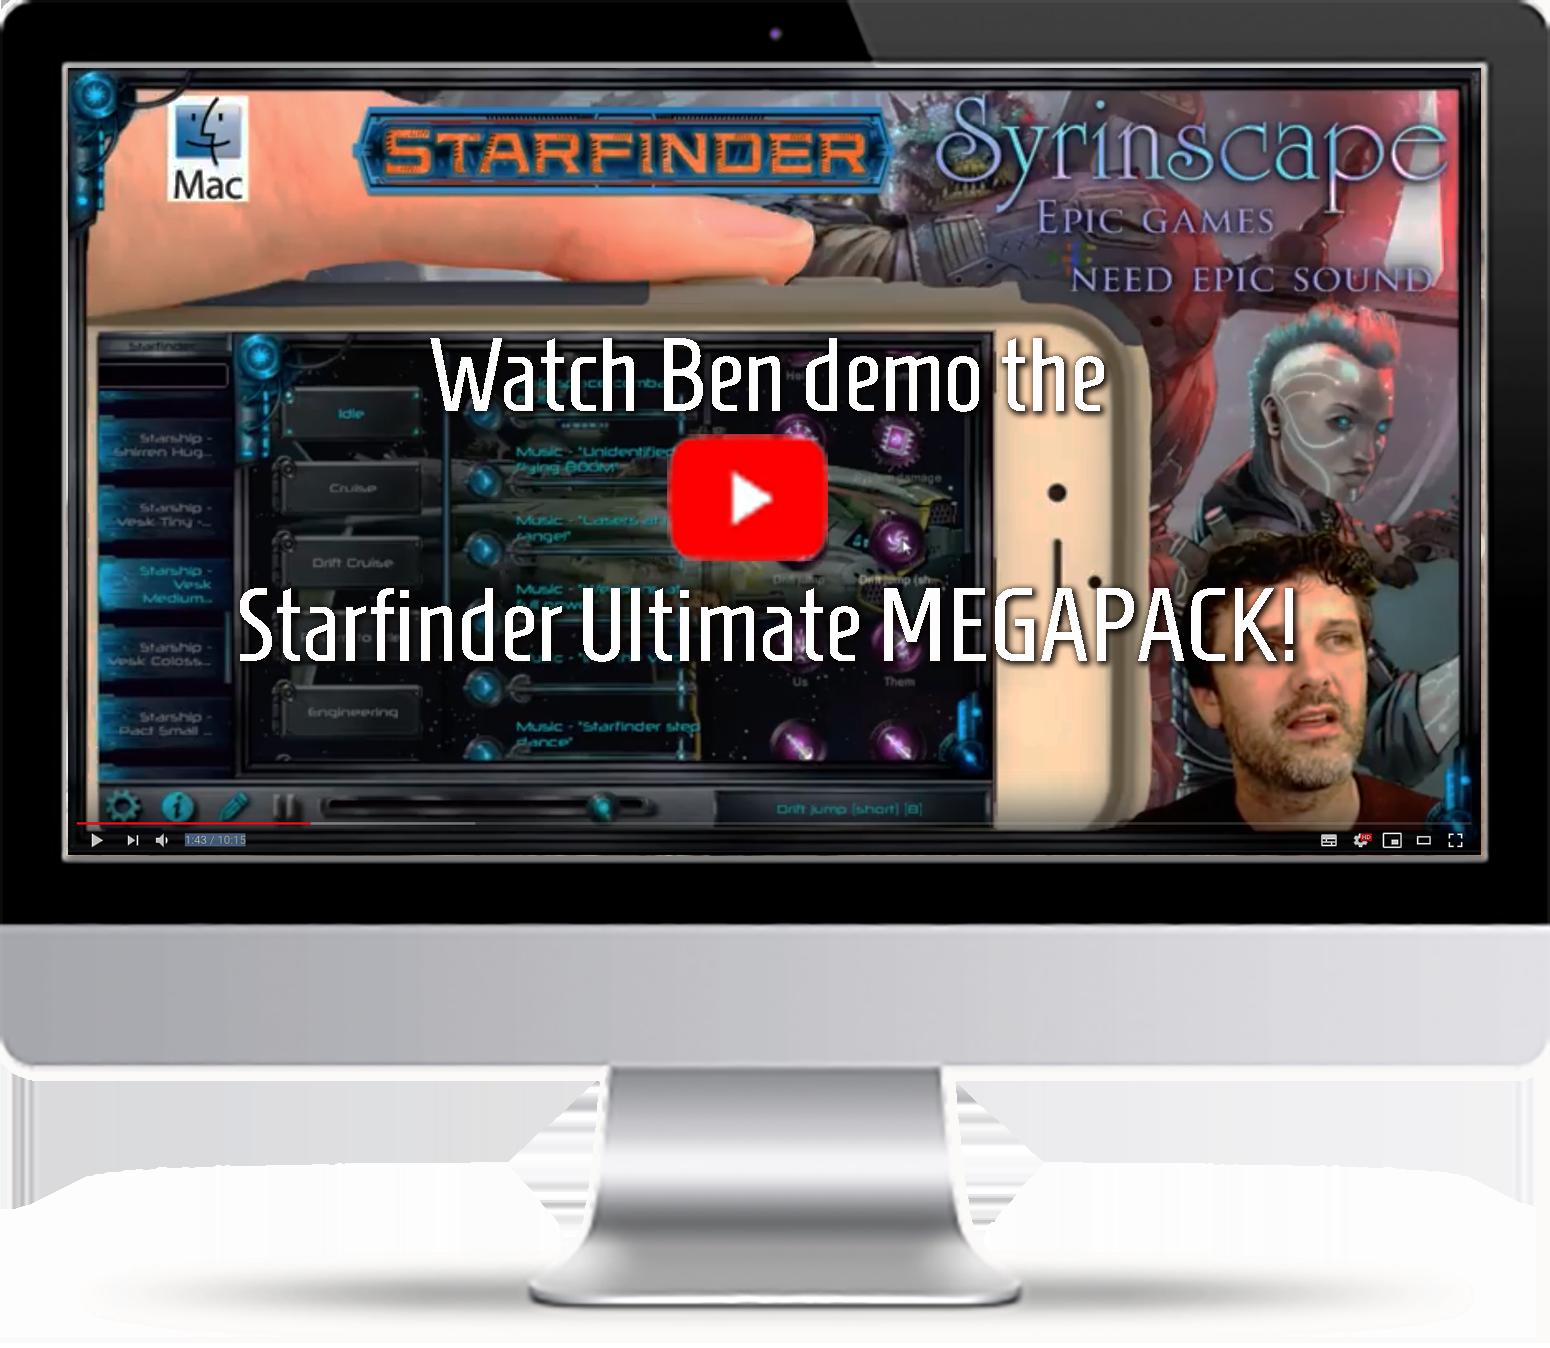 watch Ben demo the Starfinder Ultimate Megapack